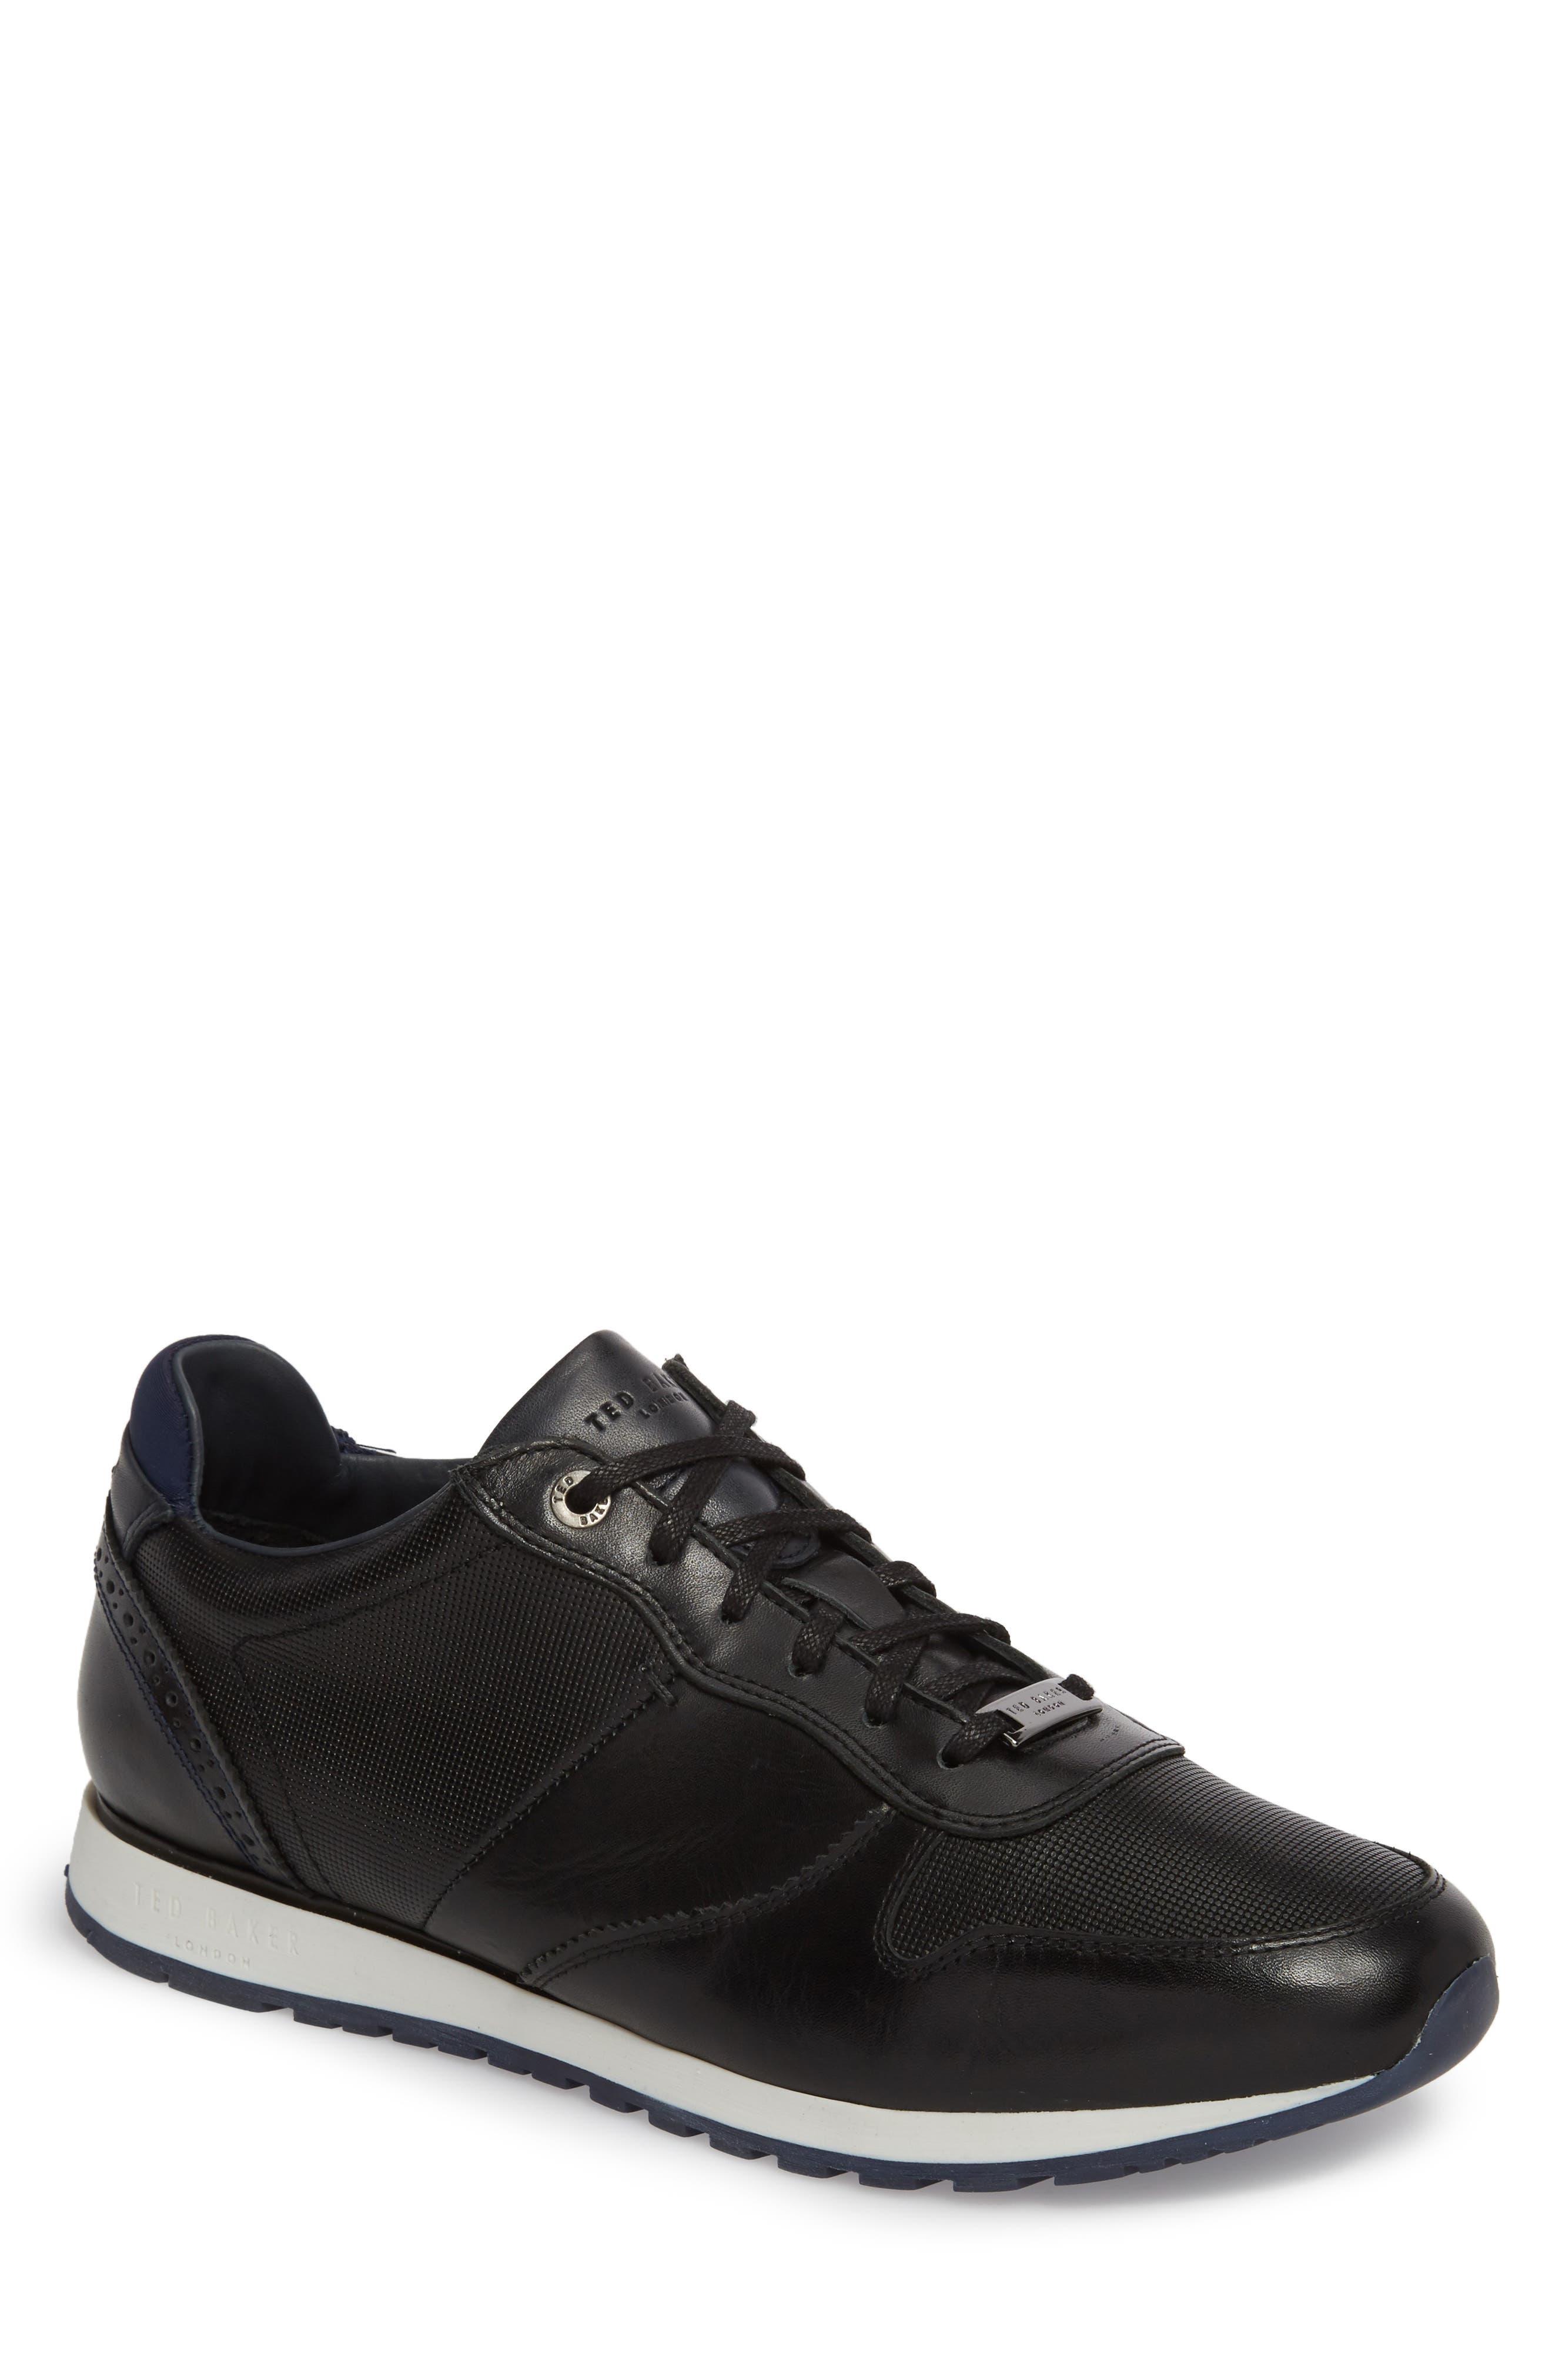 Shindl Sneaker,                         Main,                         color, Black Leather